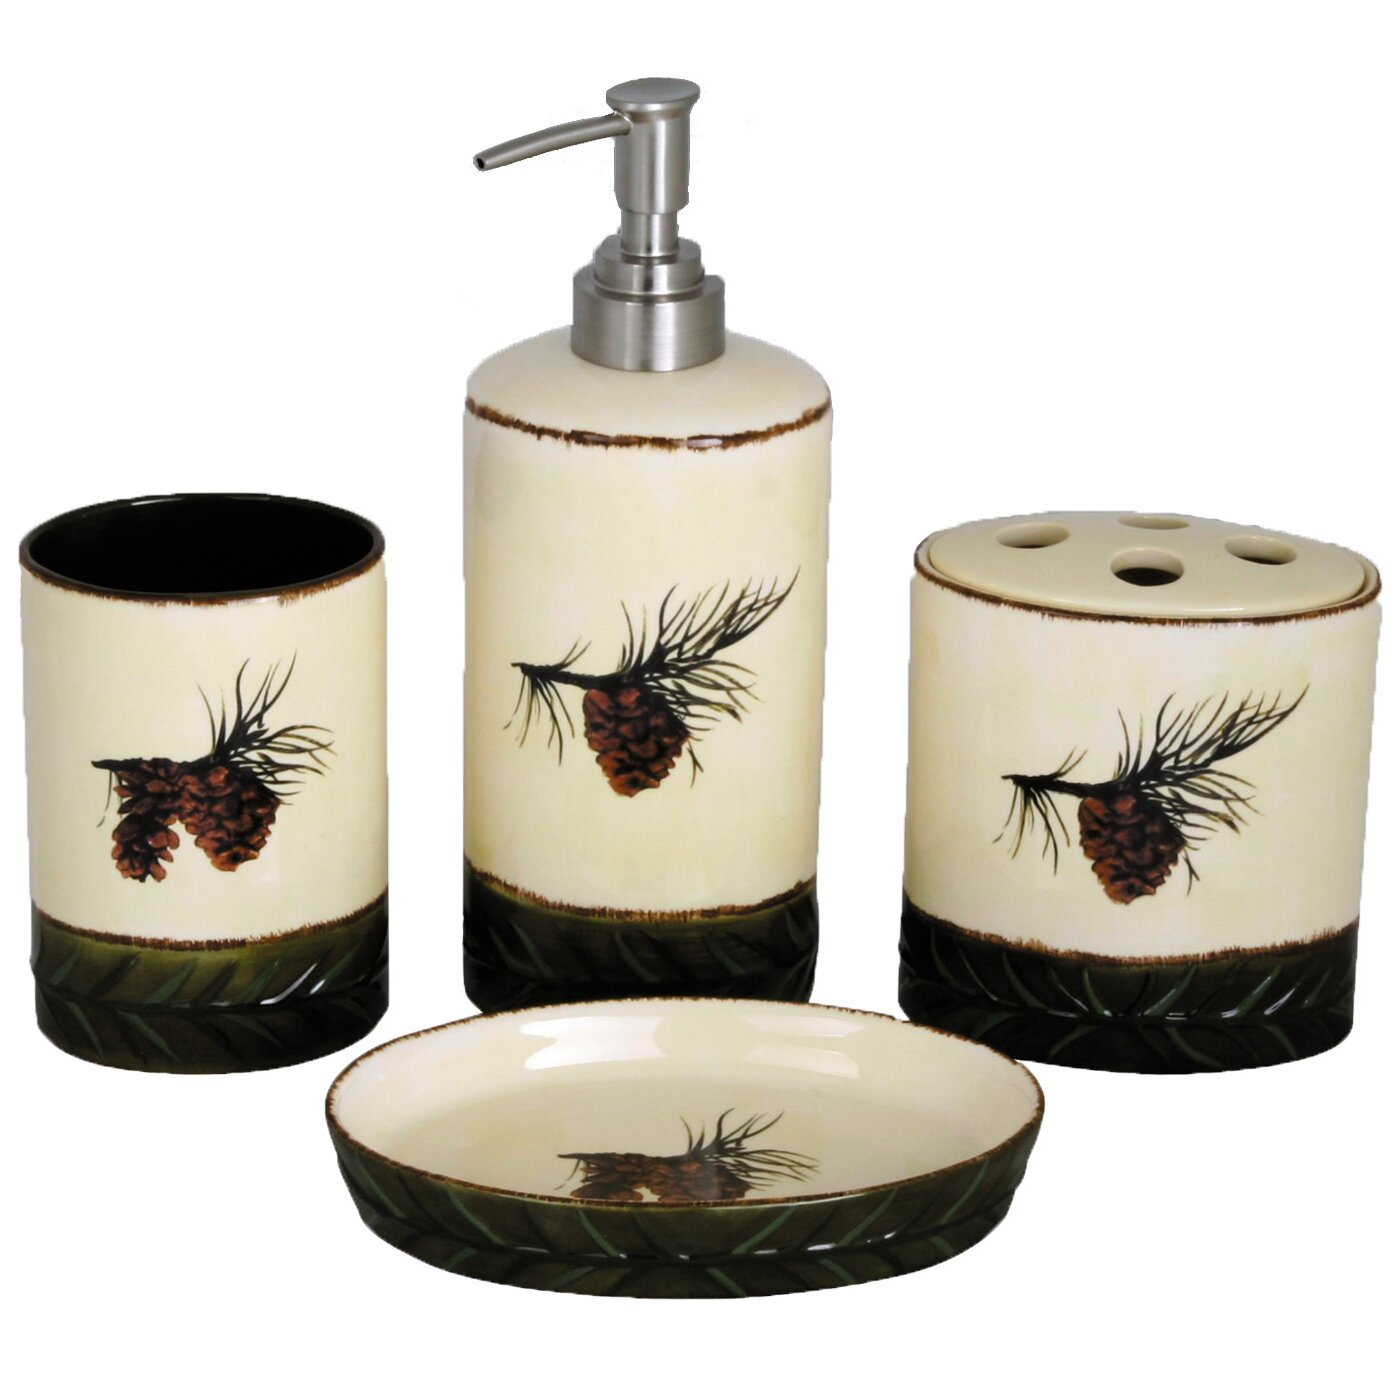 hiend accents pinecone 4-piece bathroom accessory set & reviews